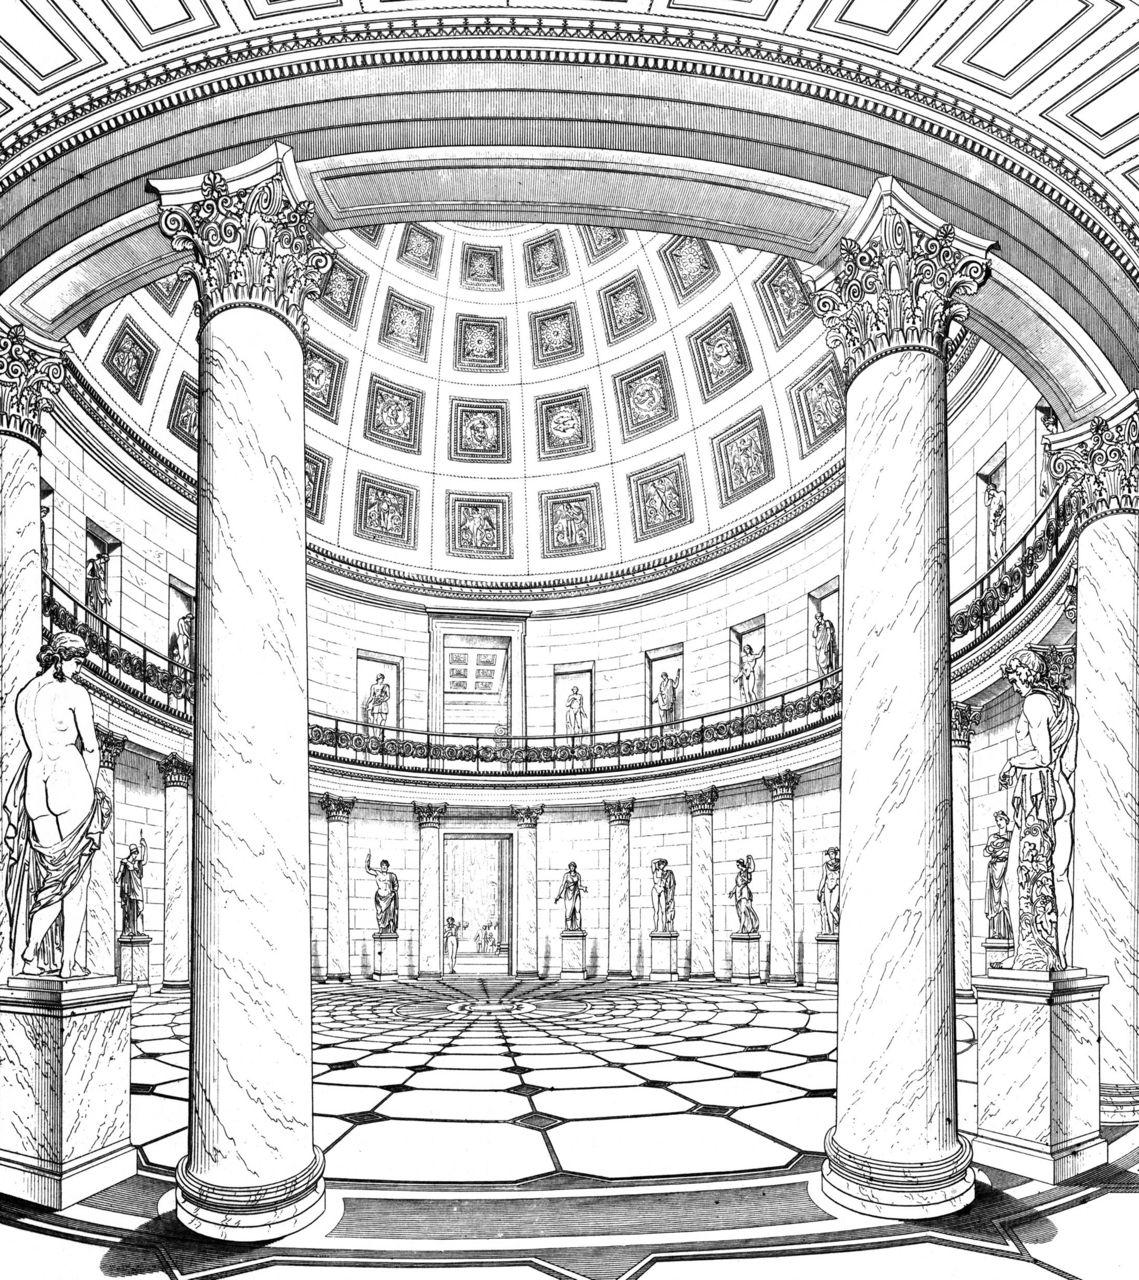 Altes museum karl friedrich schinkel berlin germany 1830 for Interior architecture berlin